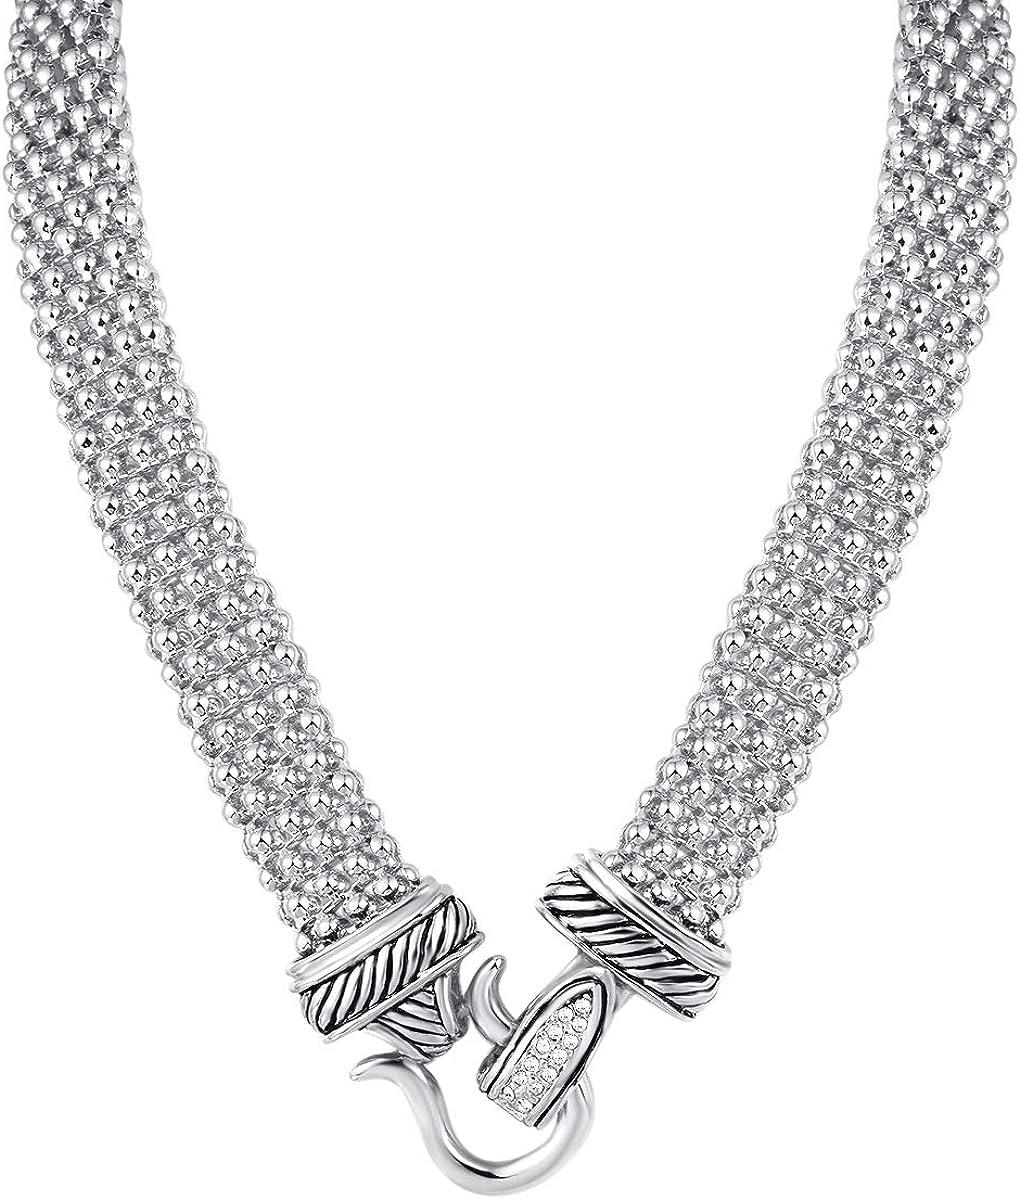 UNY Short Necklace 48cm Popcorn Chain Magnetic Claps Classic Elegant Vintage Antique Jewelry